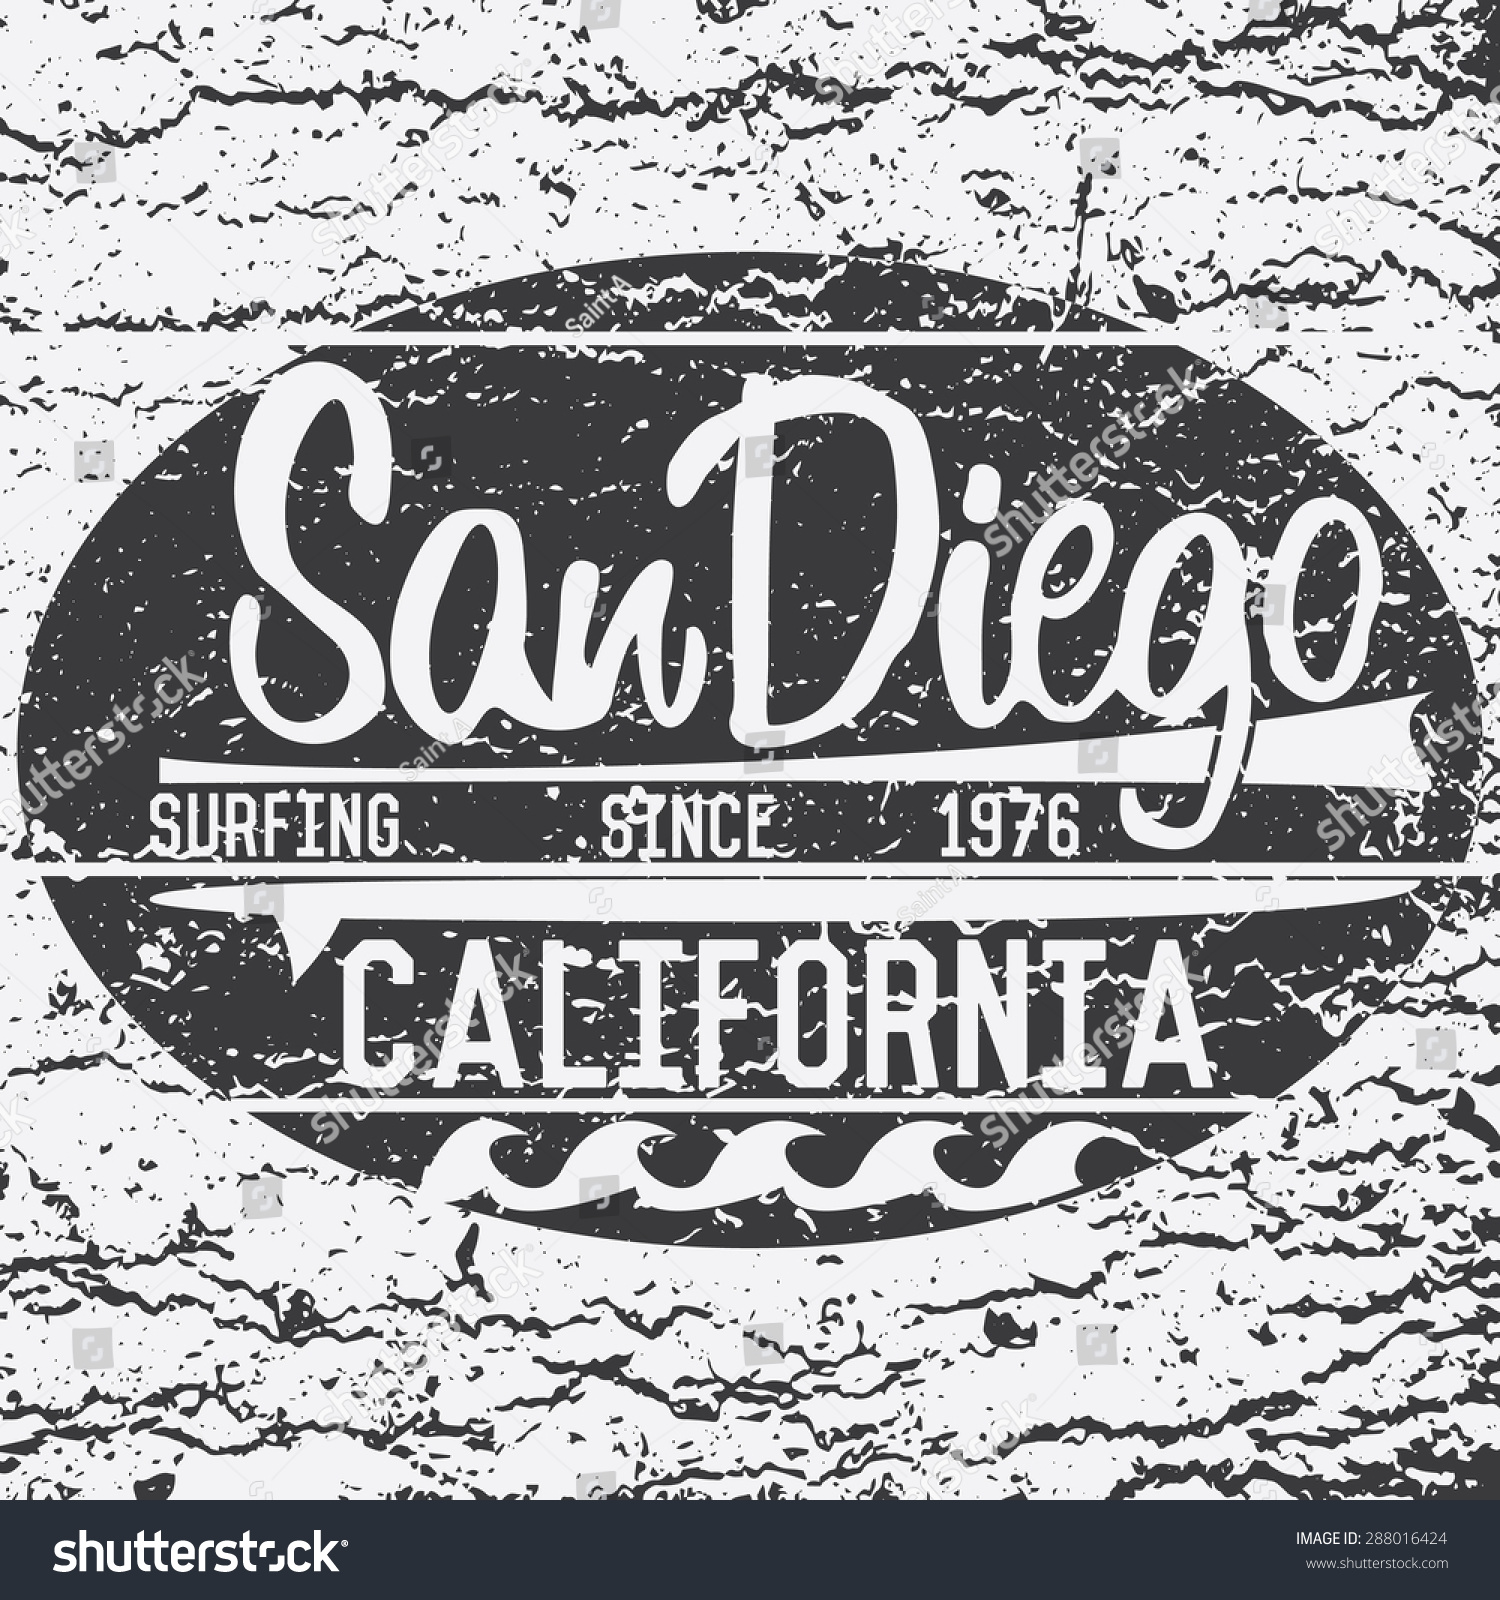 Shirt design san diego - California San Diego Typography T Shirt Printing Design Summer Vector Badge Applique Label